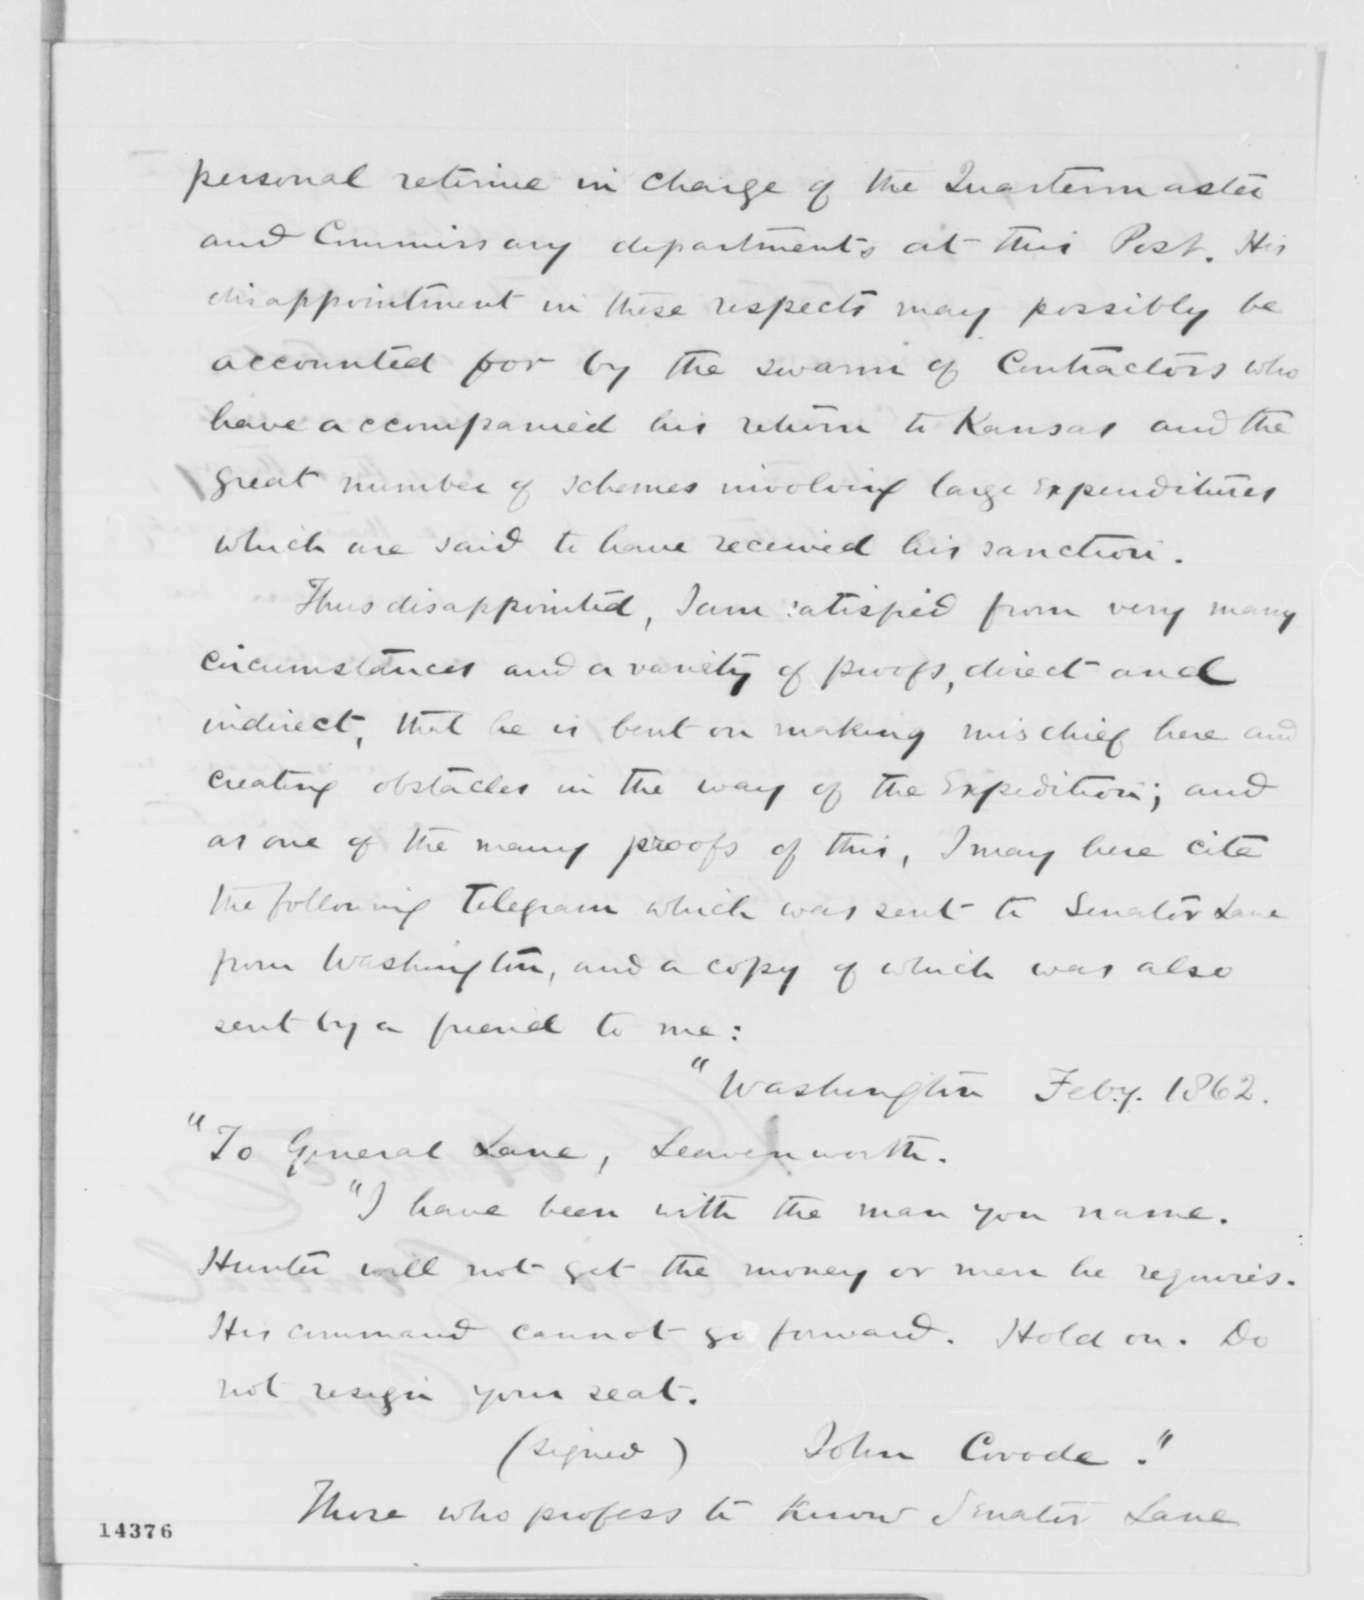 David Hunter to Abraham Lincoln, Tuesday, February 04, 1862  (Senator James Lane)